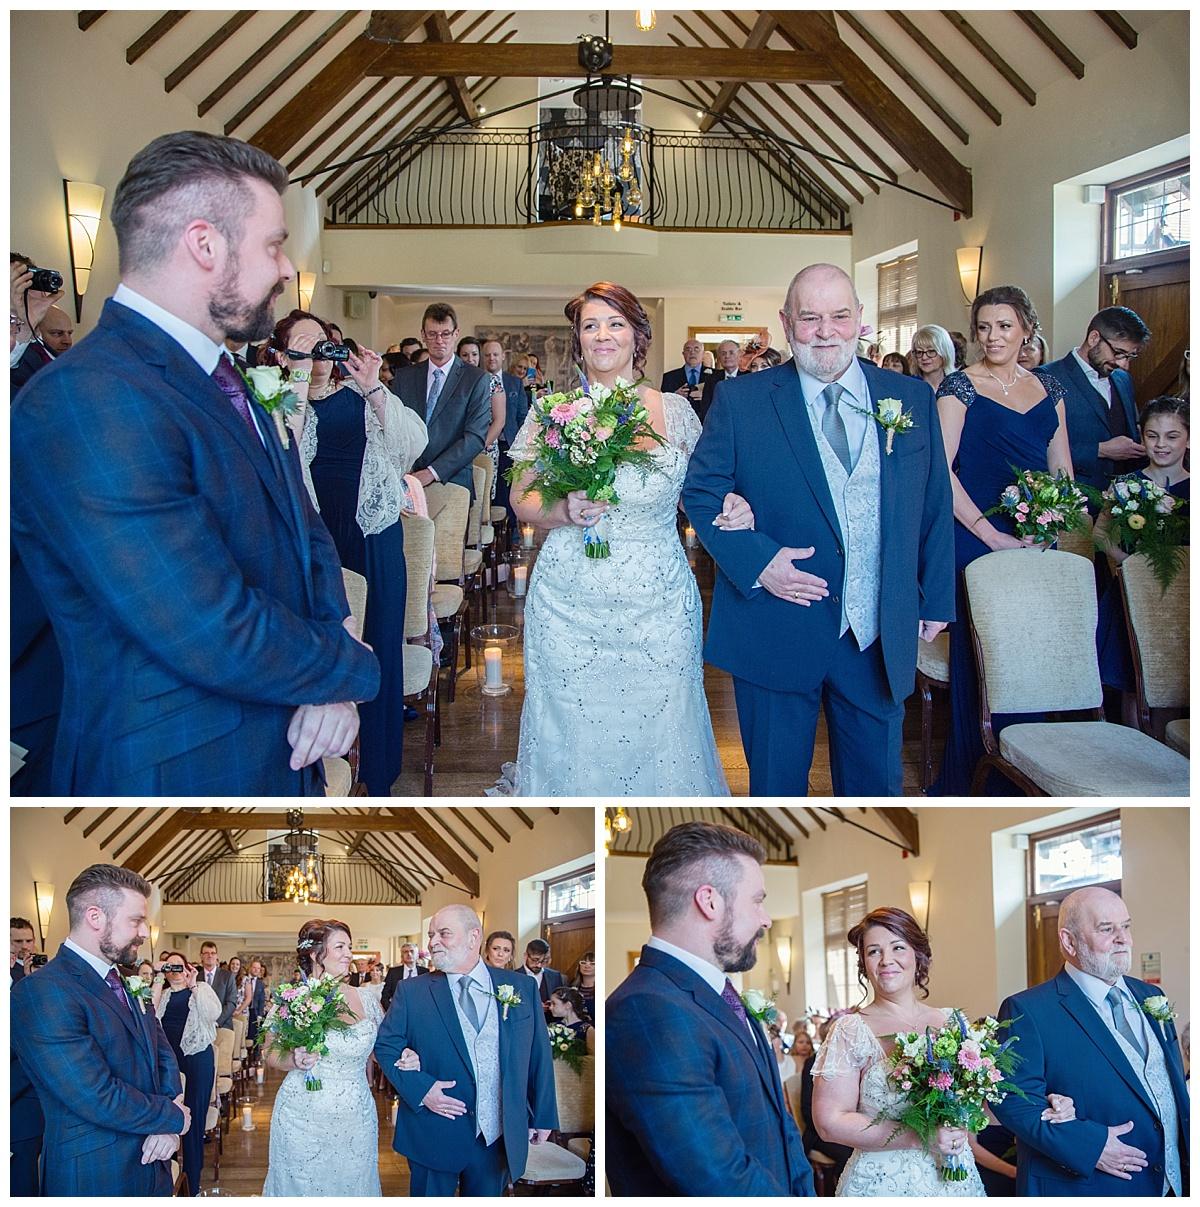 bride wlking down the aisle